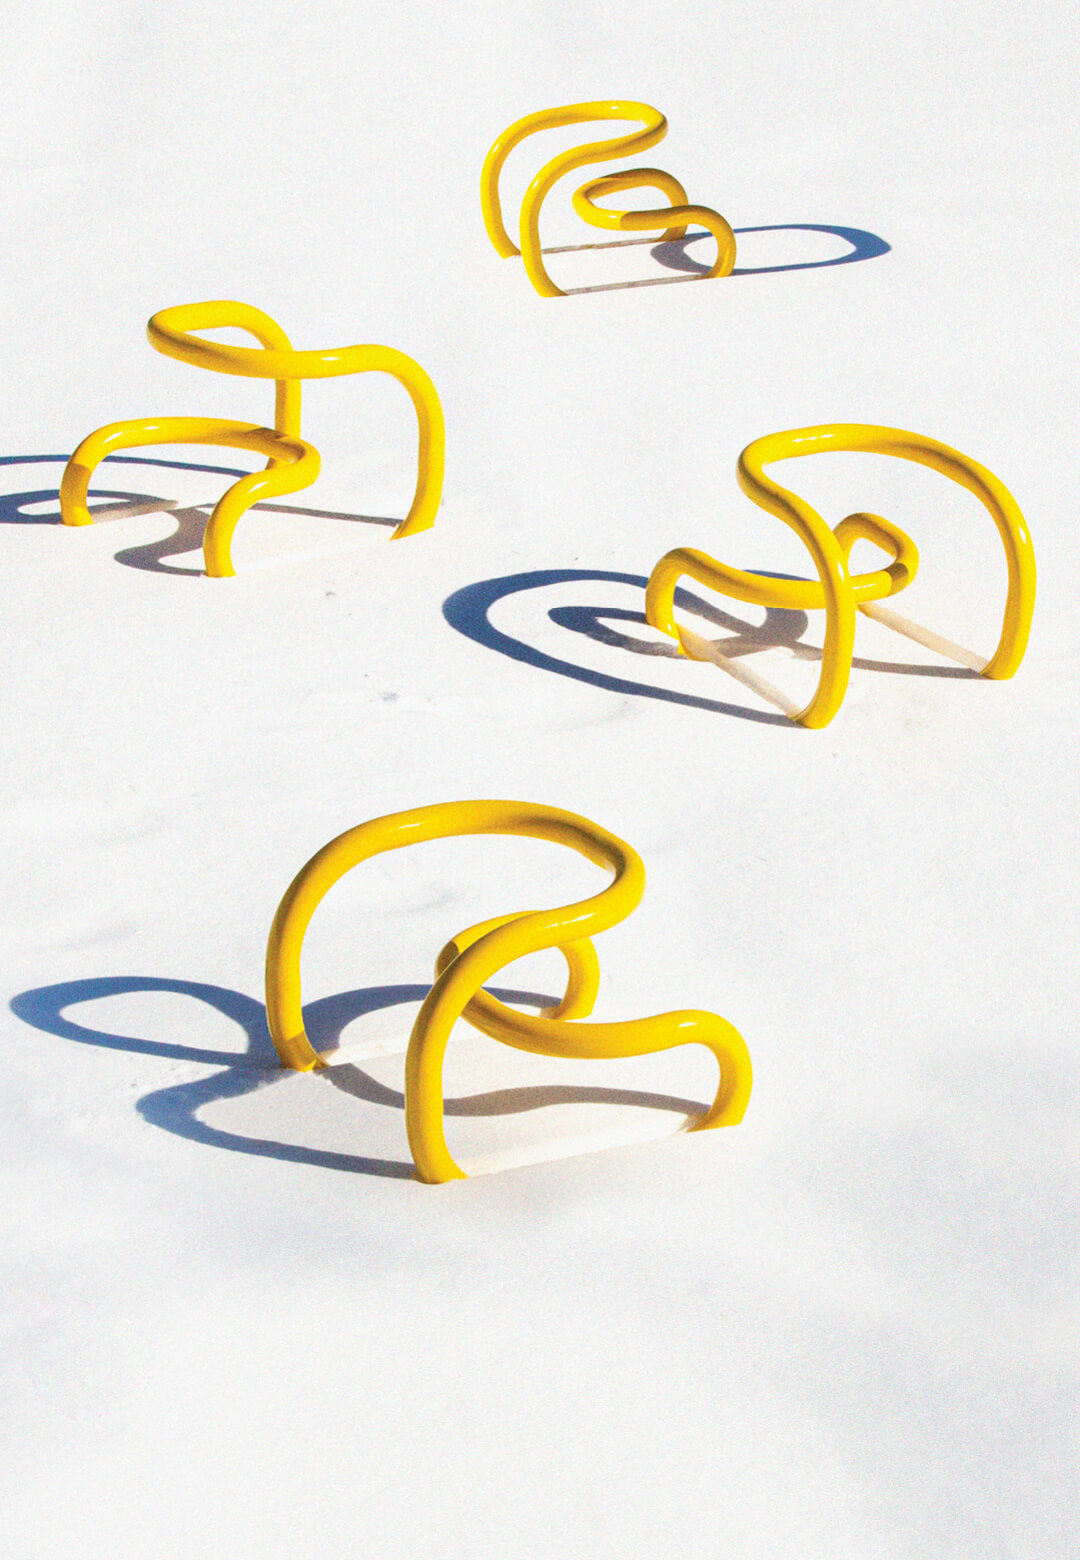 The quirky Loopy Chair by Nikolas Bentel looks like a steel bike rack | Loopy Chair| Nikolas Bentel | STIRworld